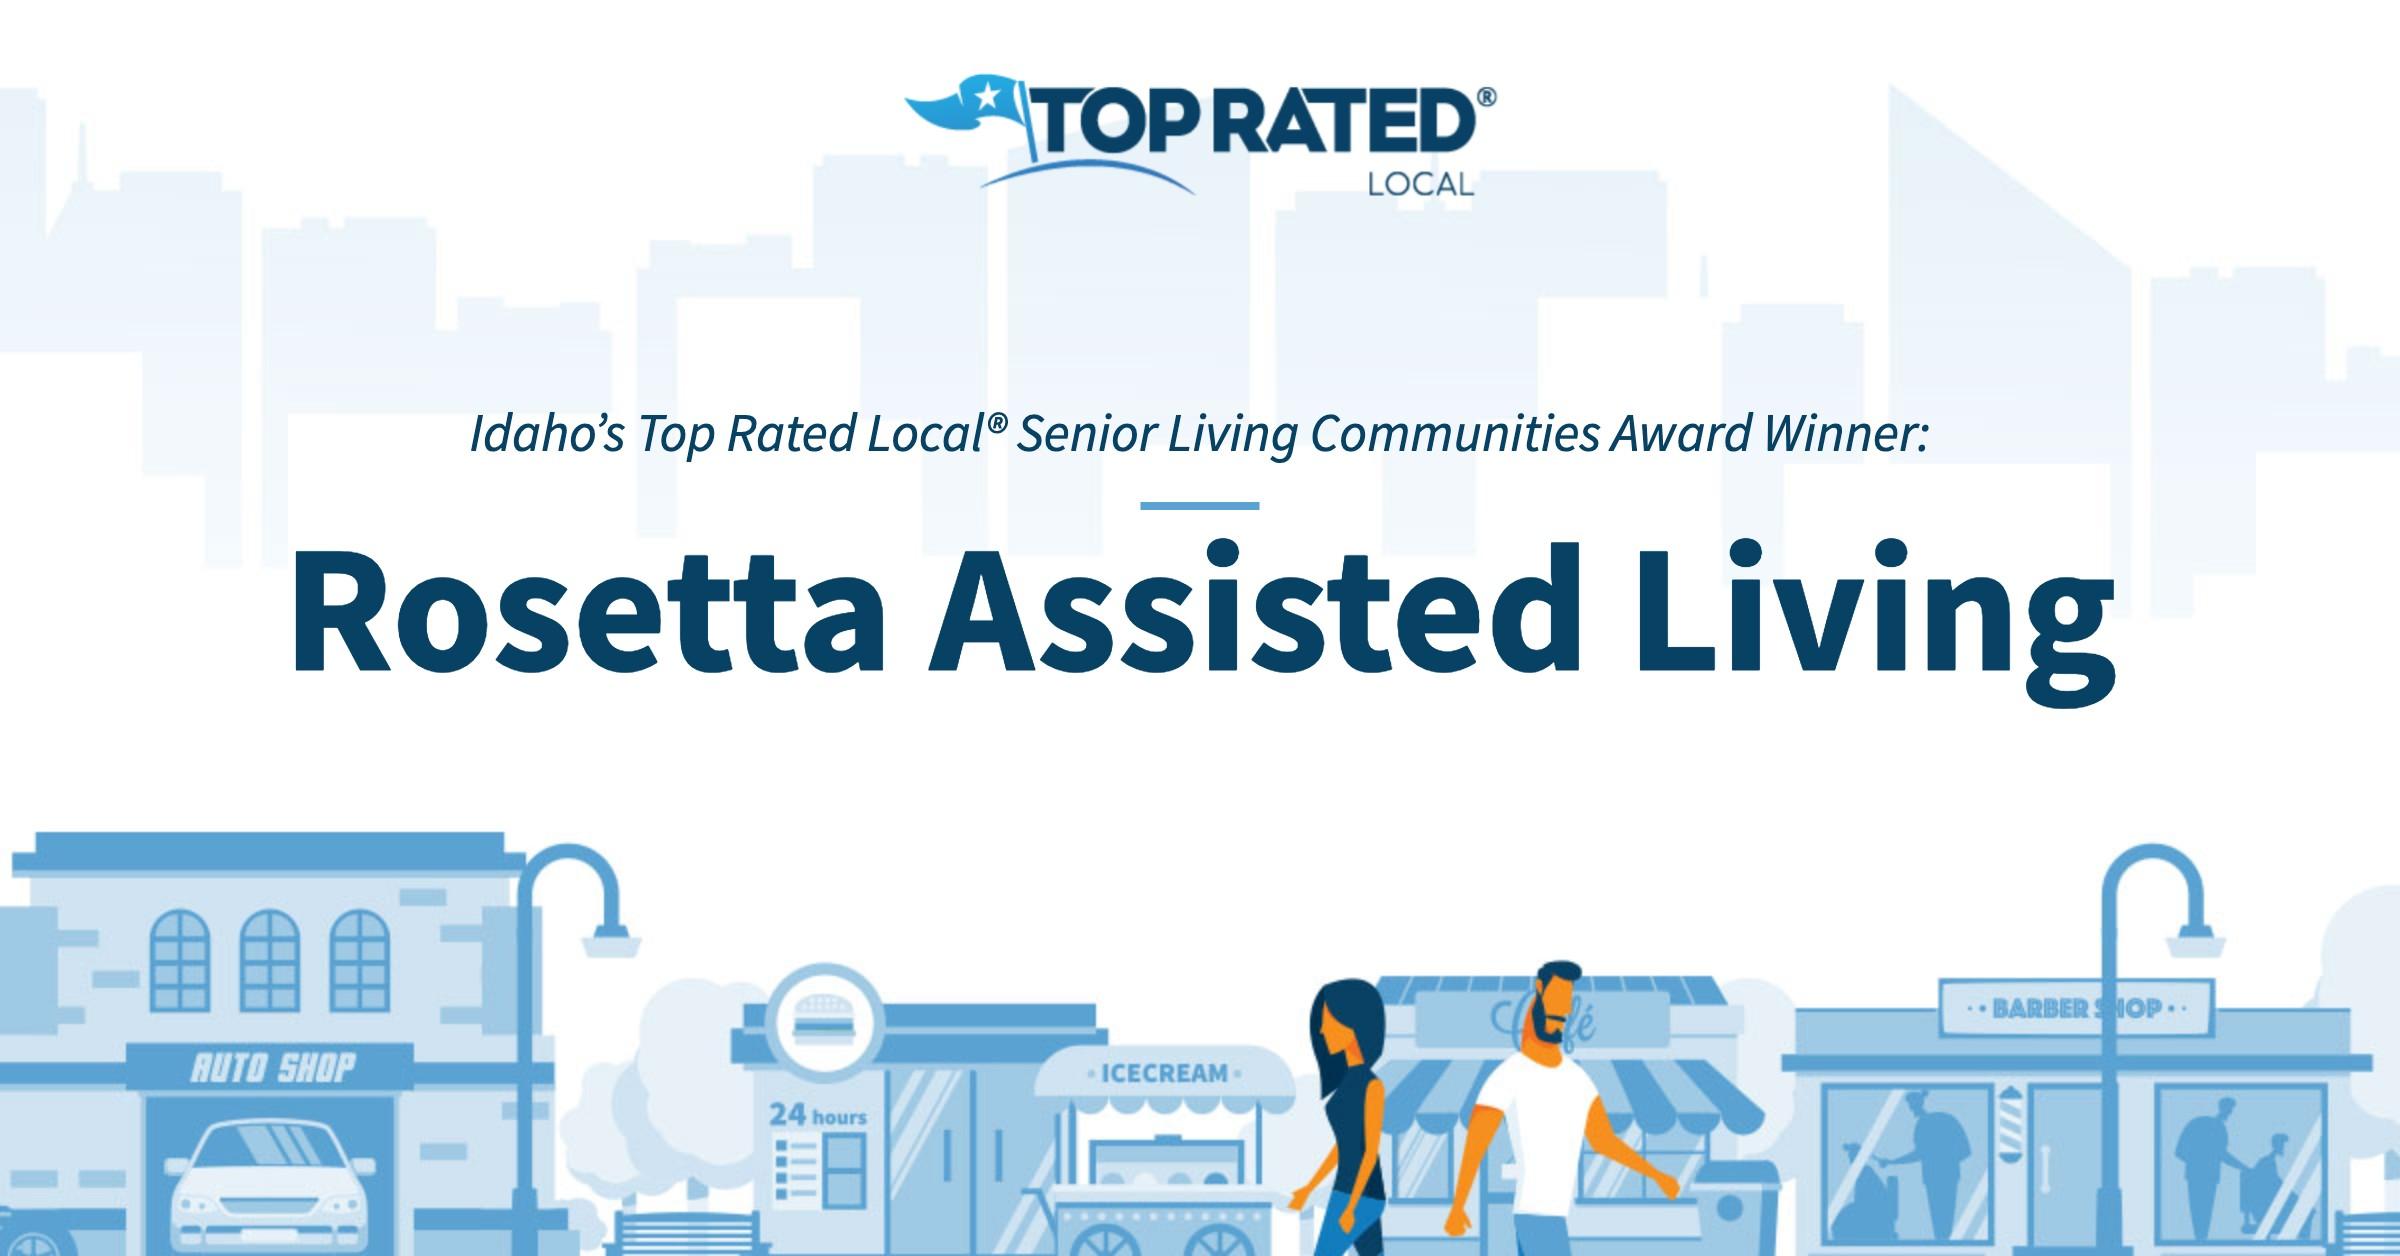 Idaho's Top Rated Local® Senior Living Communities Award Winner: Rosetta Assisted Living